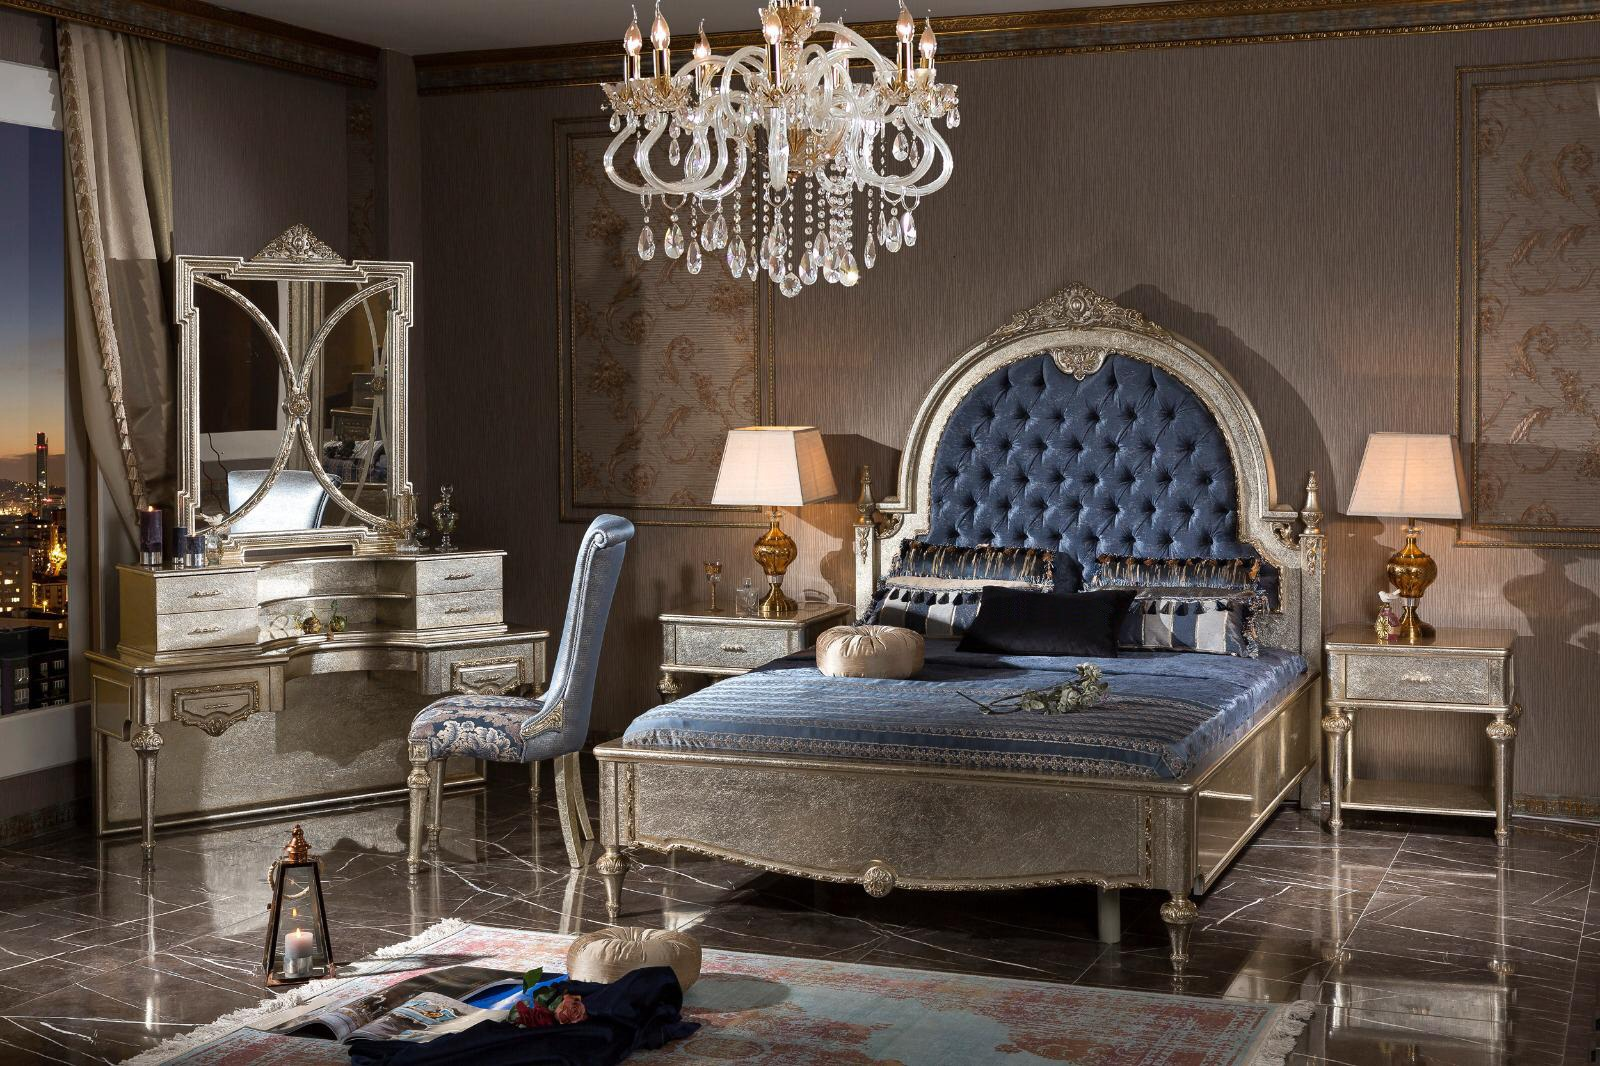 Unique Bridal Furniture Designs that will Make Your ...